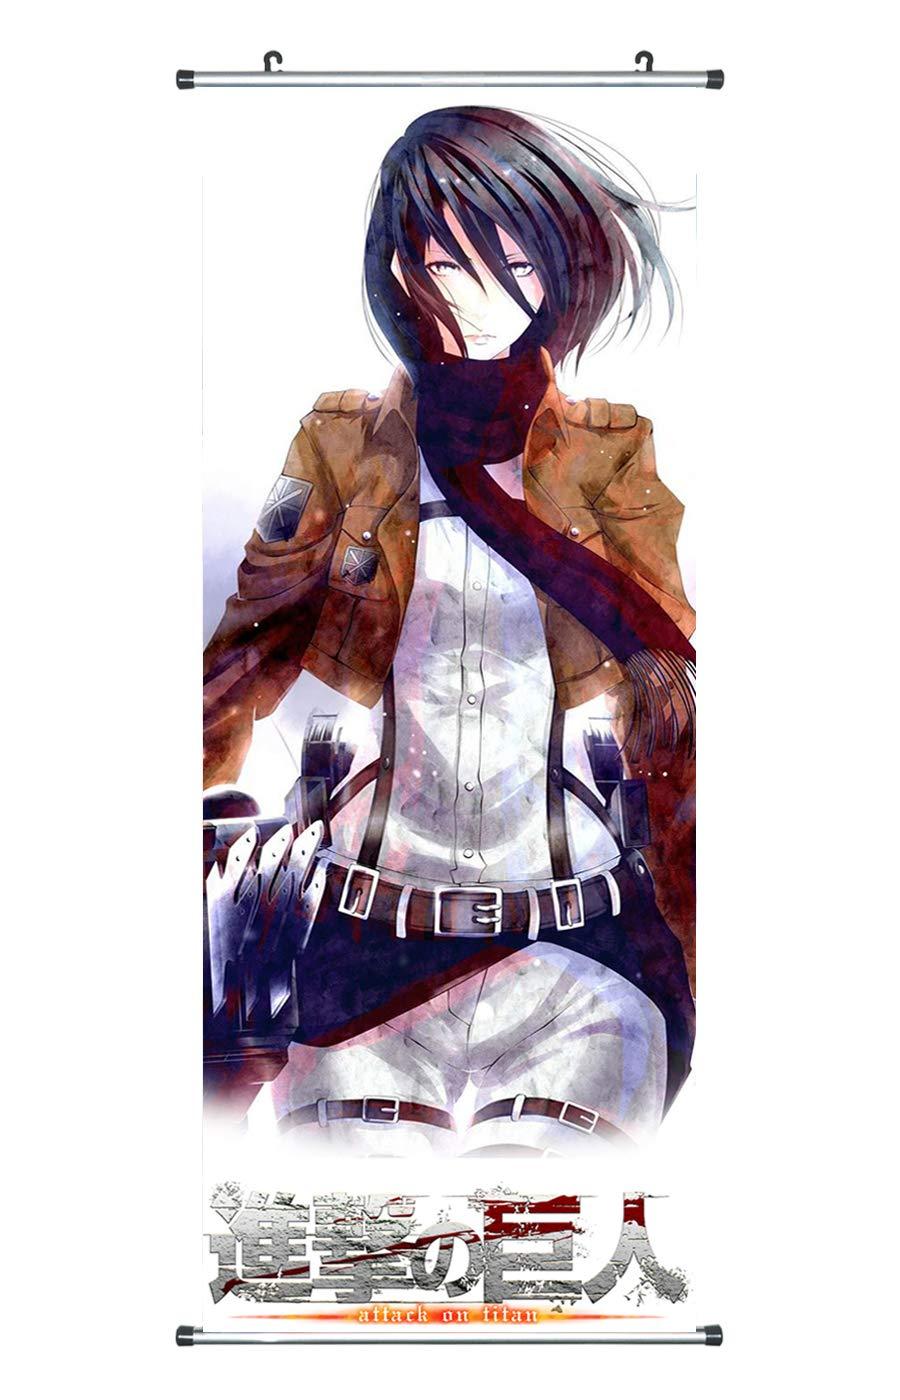 CoolChange Attack on Titan Kakemono/Poster made of fabric, 100x40cm, Theme: Levi Ackermann